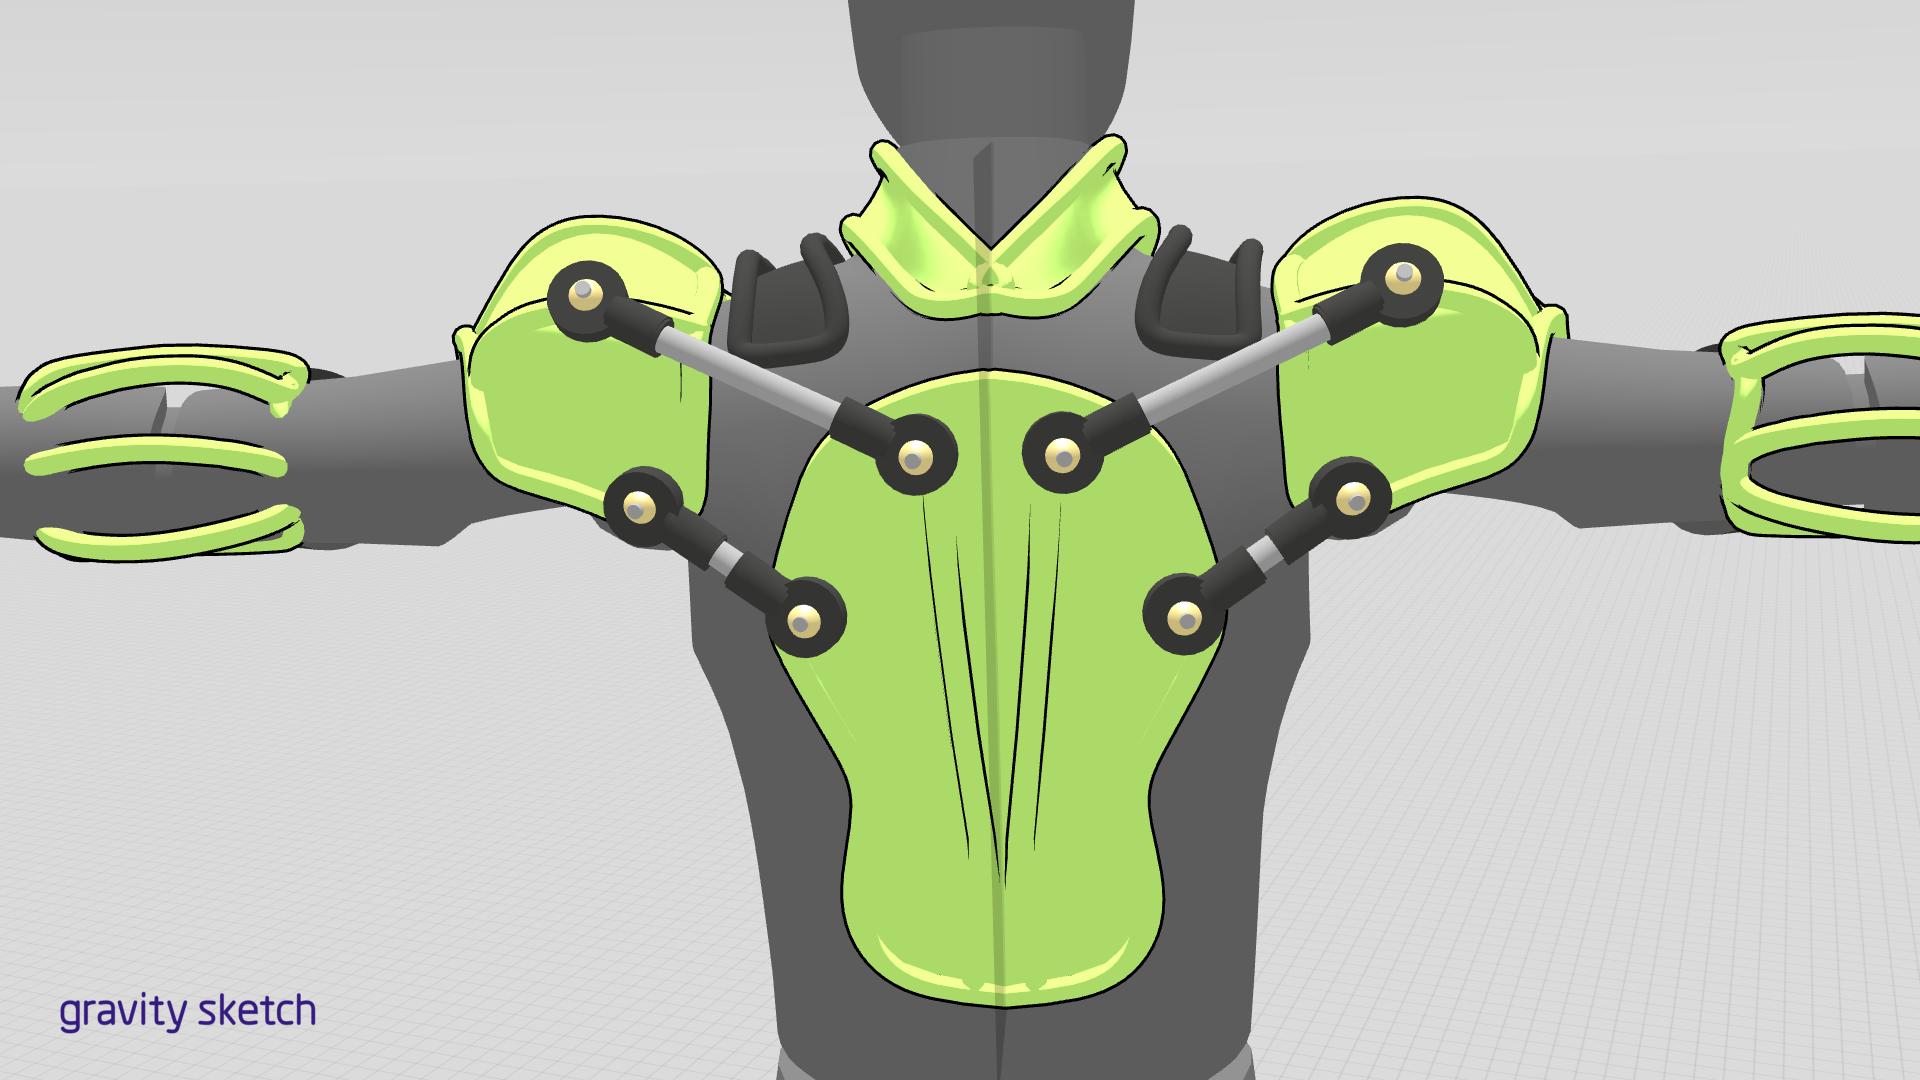 Smarte Rehabilitation: Expertenteam entwickelt intelligentes Soft-Exoskelett